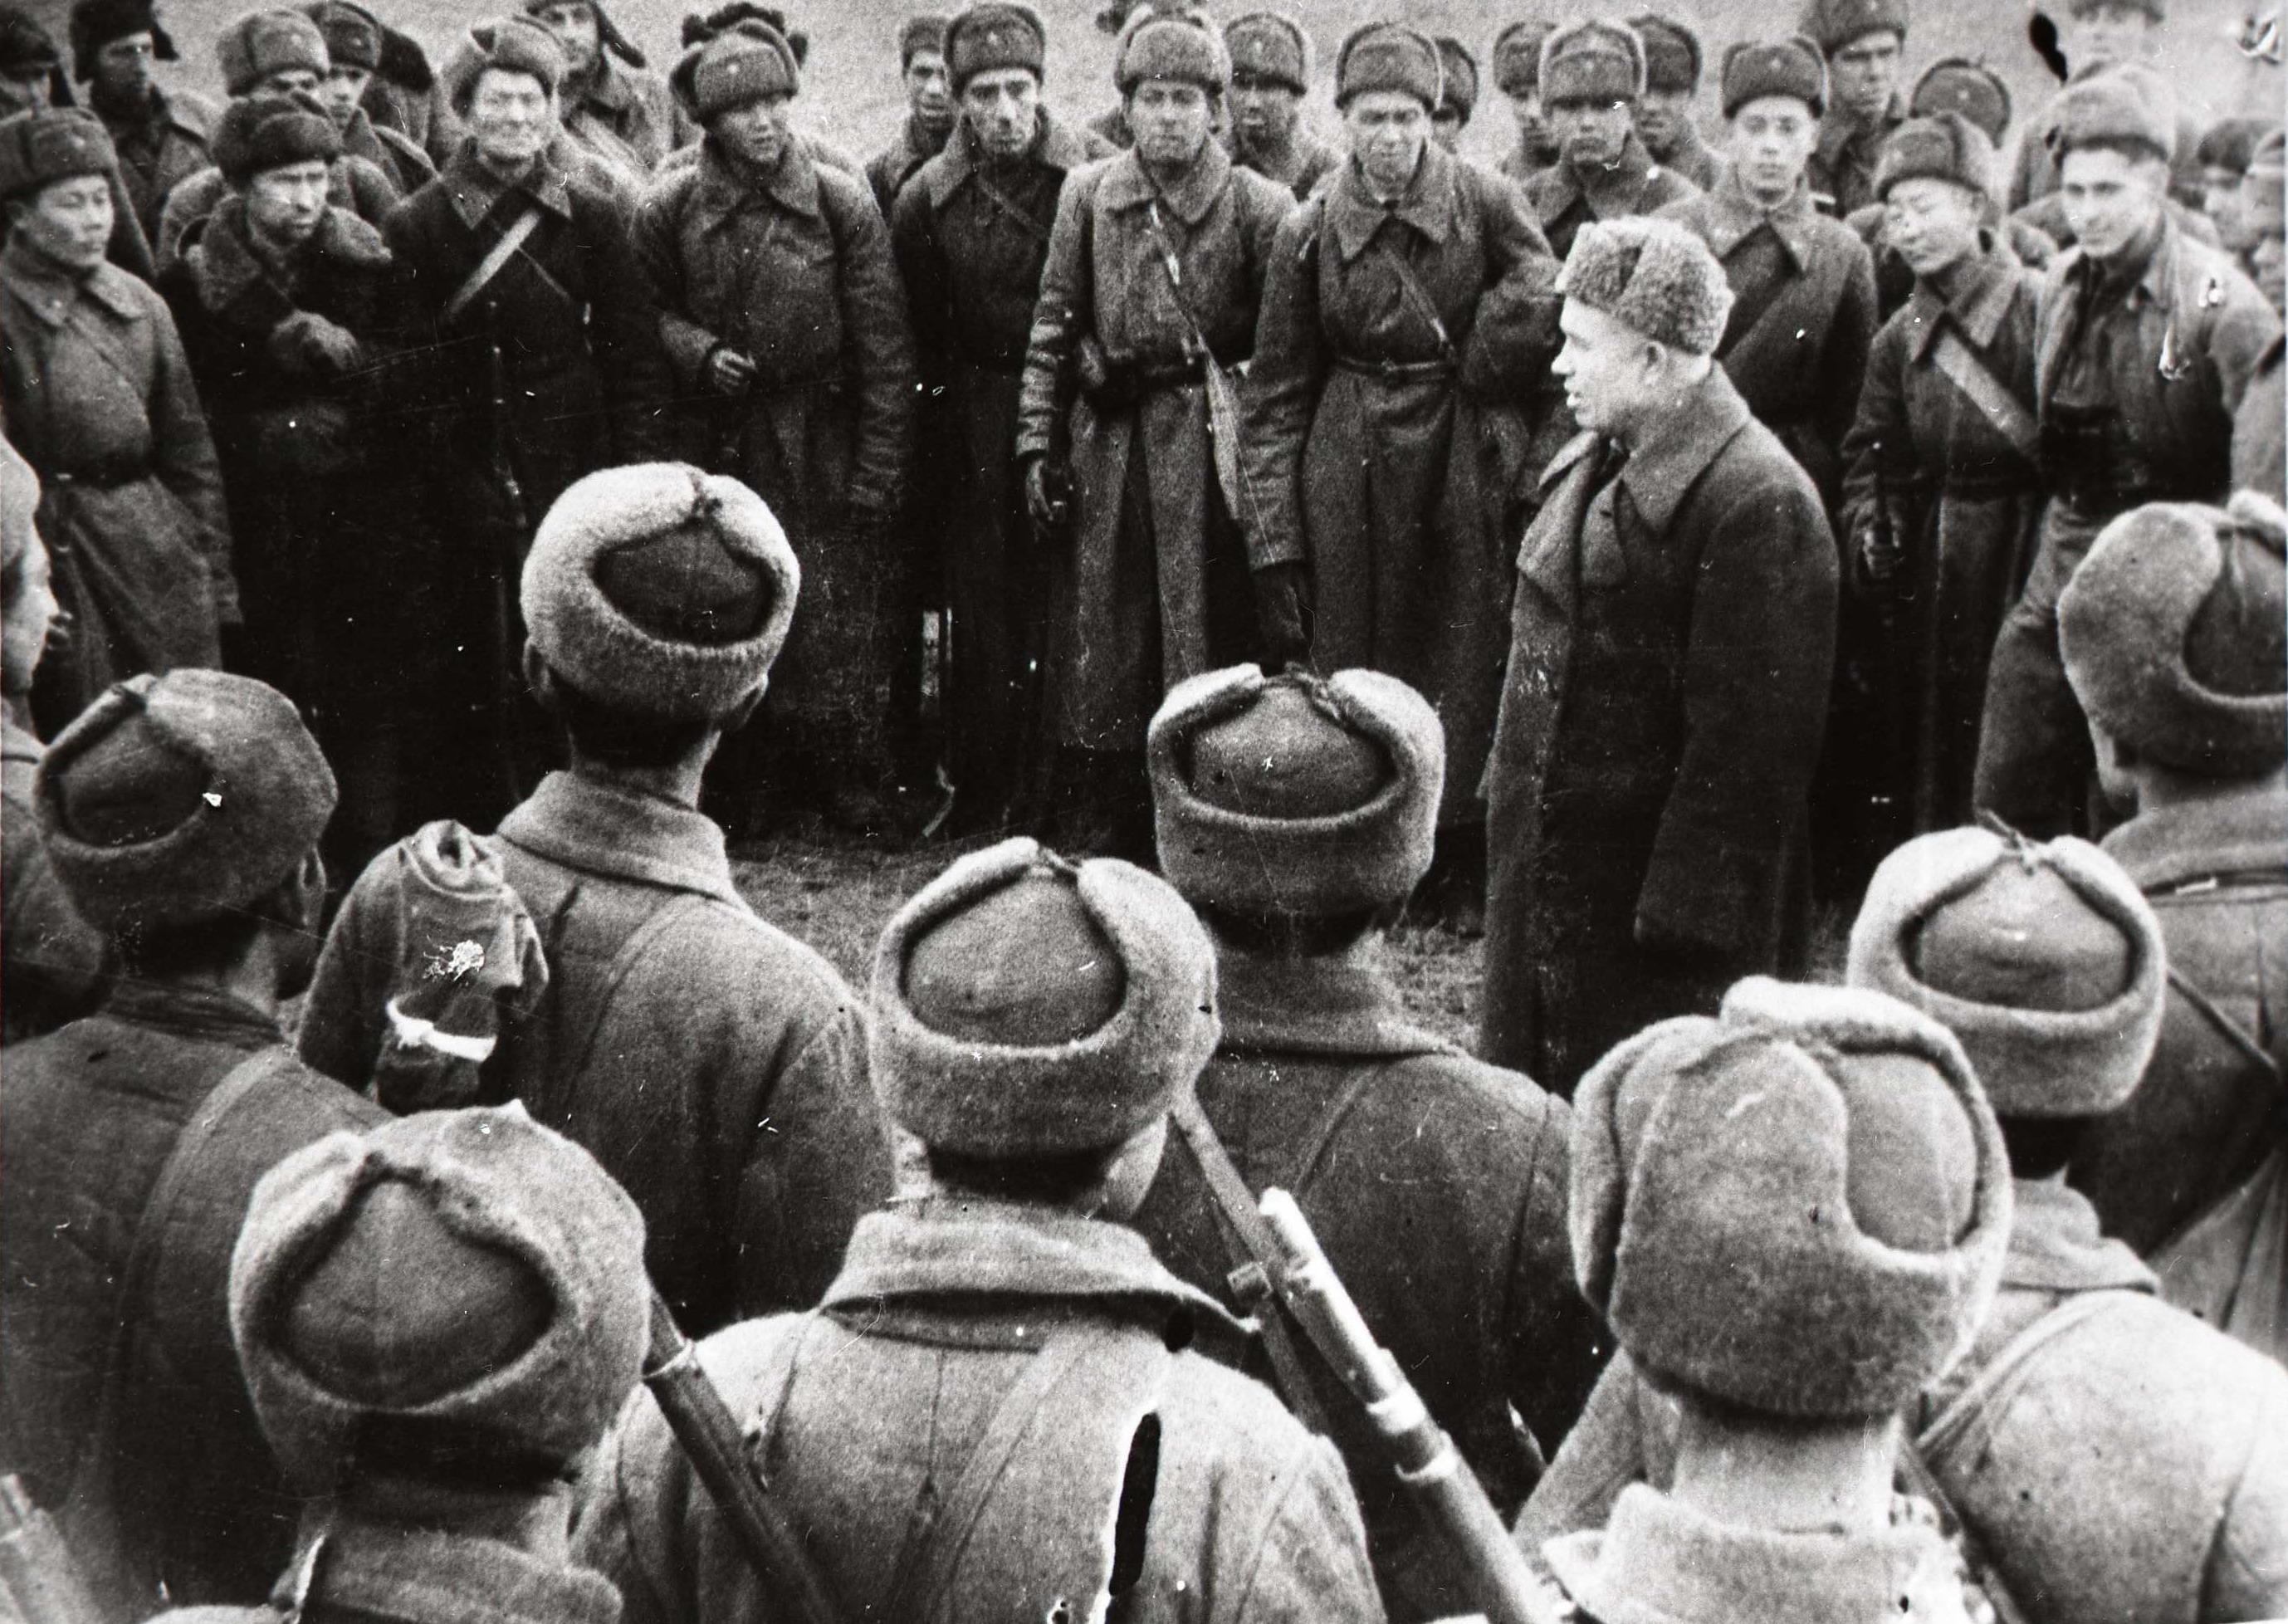 Никита Хрущев среди солдат в Сталинграде, 1942 год